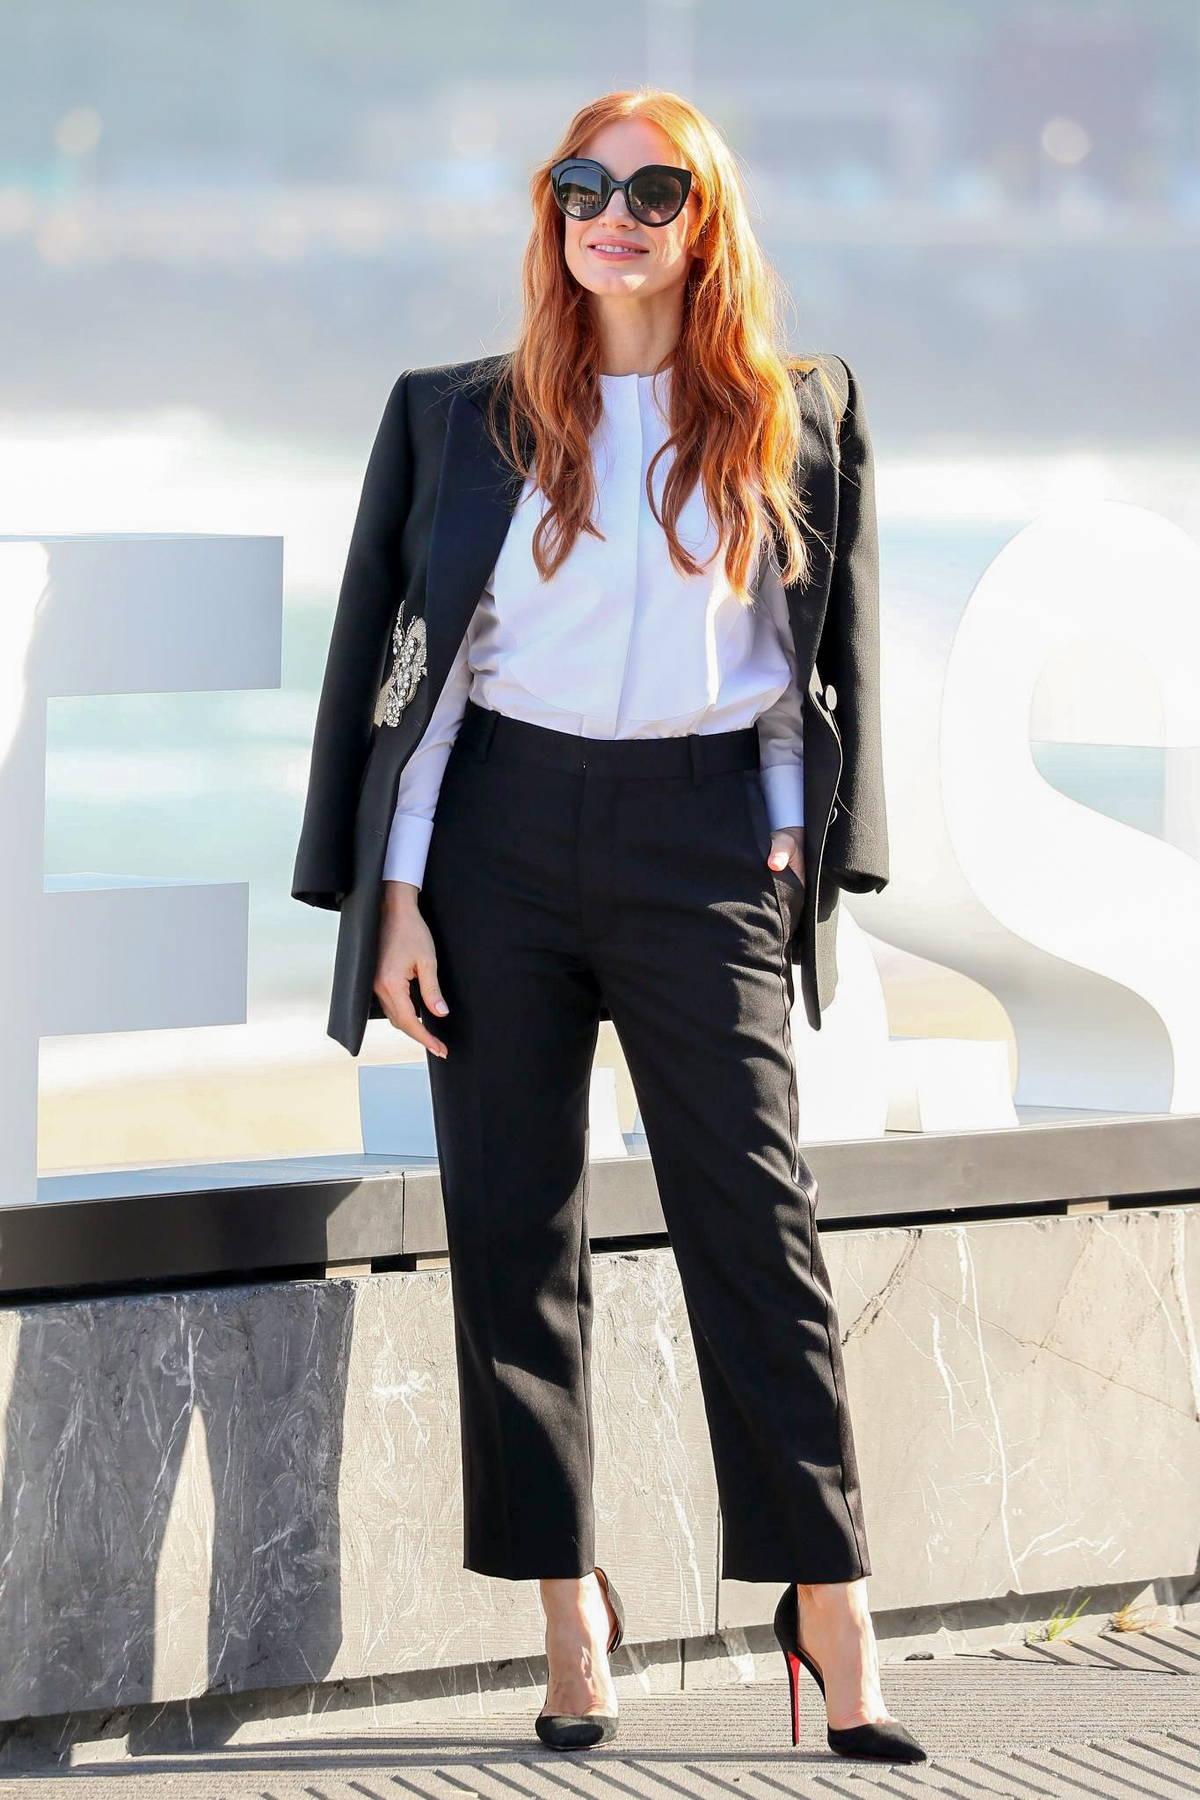 Jessica Chastain attends a photocall for 'The Eyes of Tammy Faye' during San Sebastian International Film Festival in San Sebastian, Spain